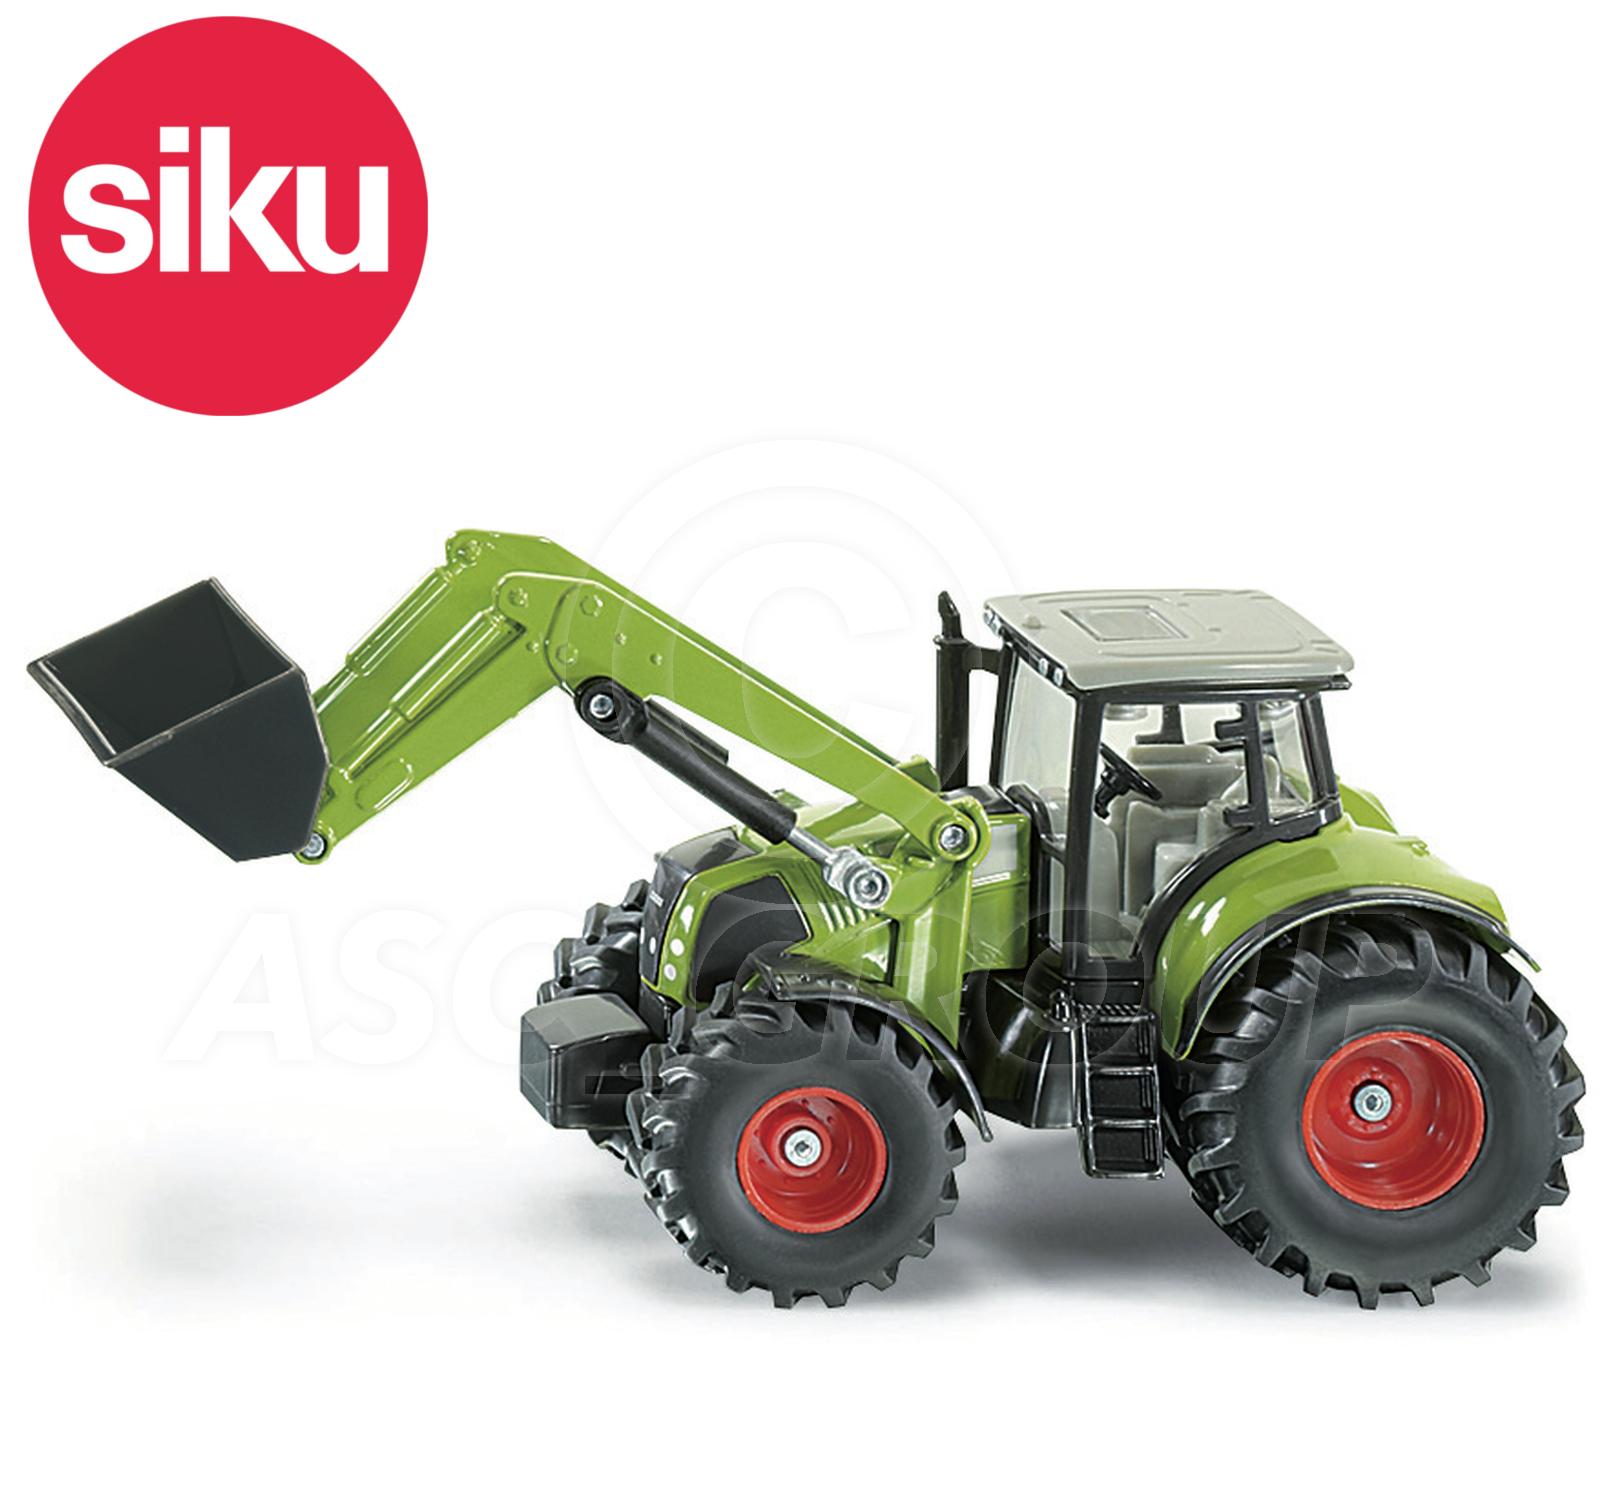 Siku no  claas axion traktor mit frontlader